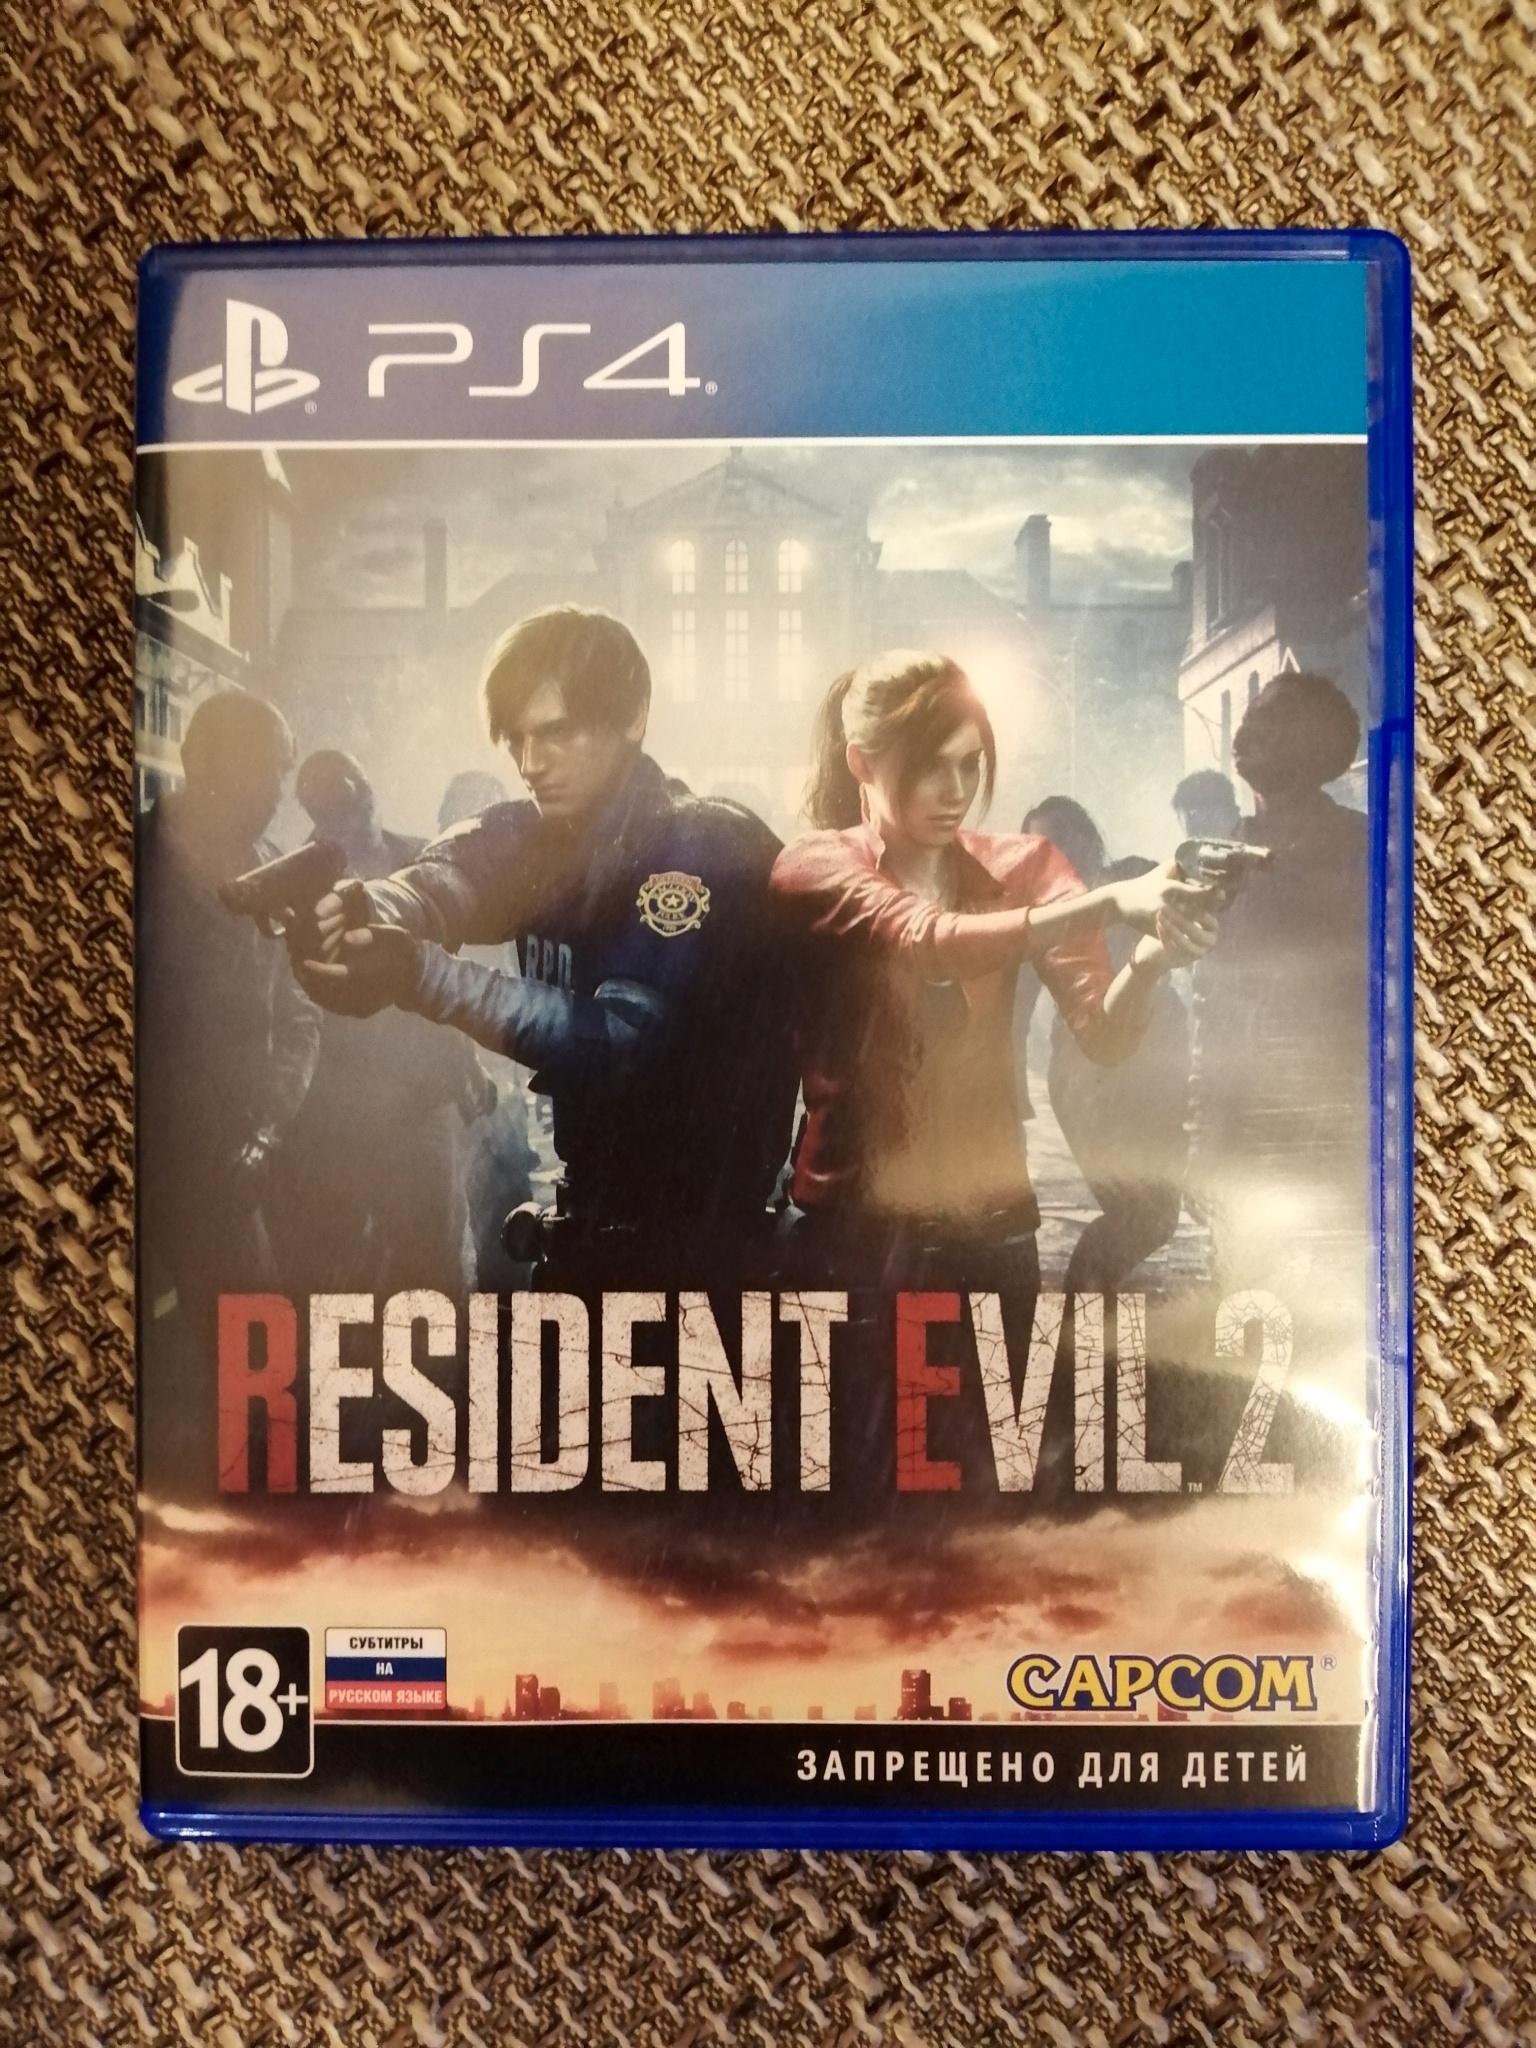 Играть resident evil 2 онлайн